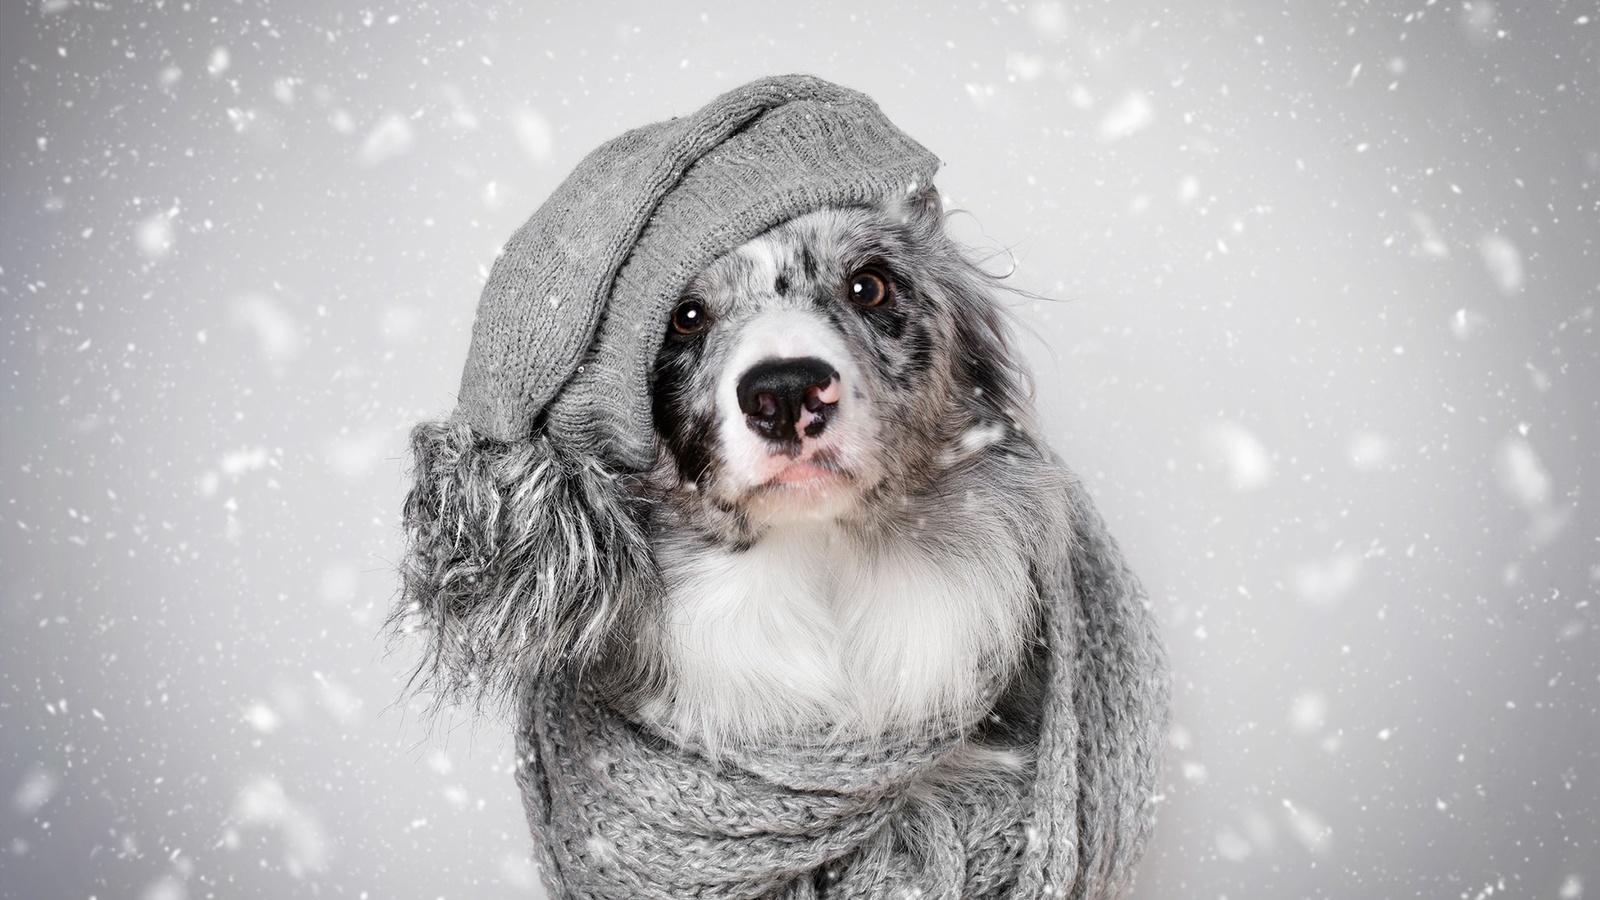 животное, собака, пёс, бордер-колли, шапка, шарф, взгляд, зима, снег